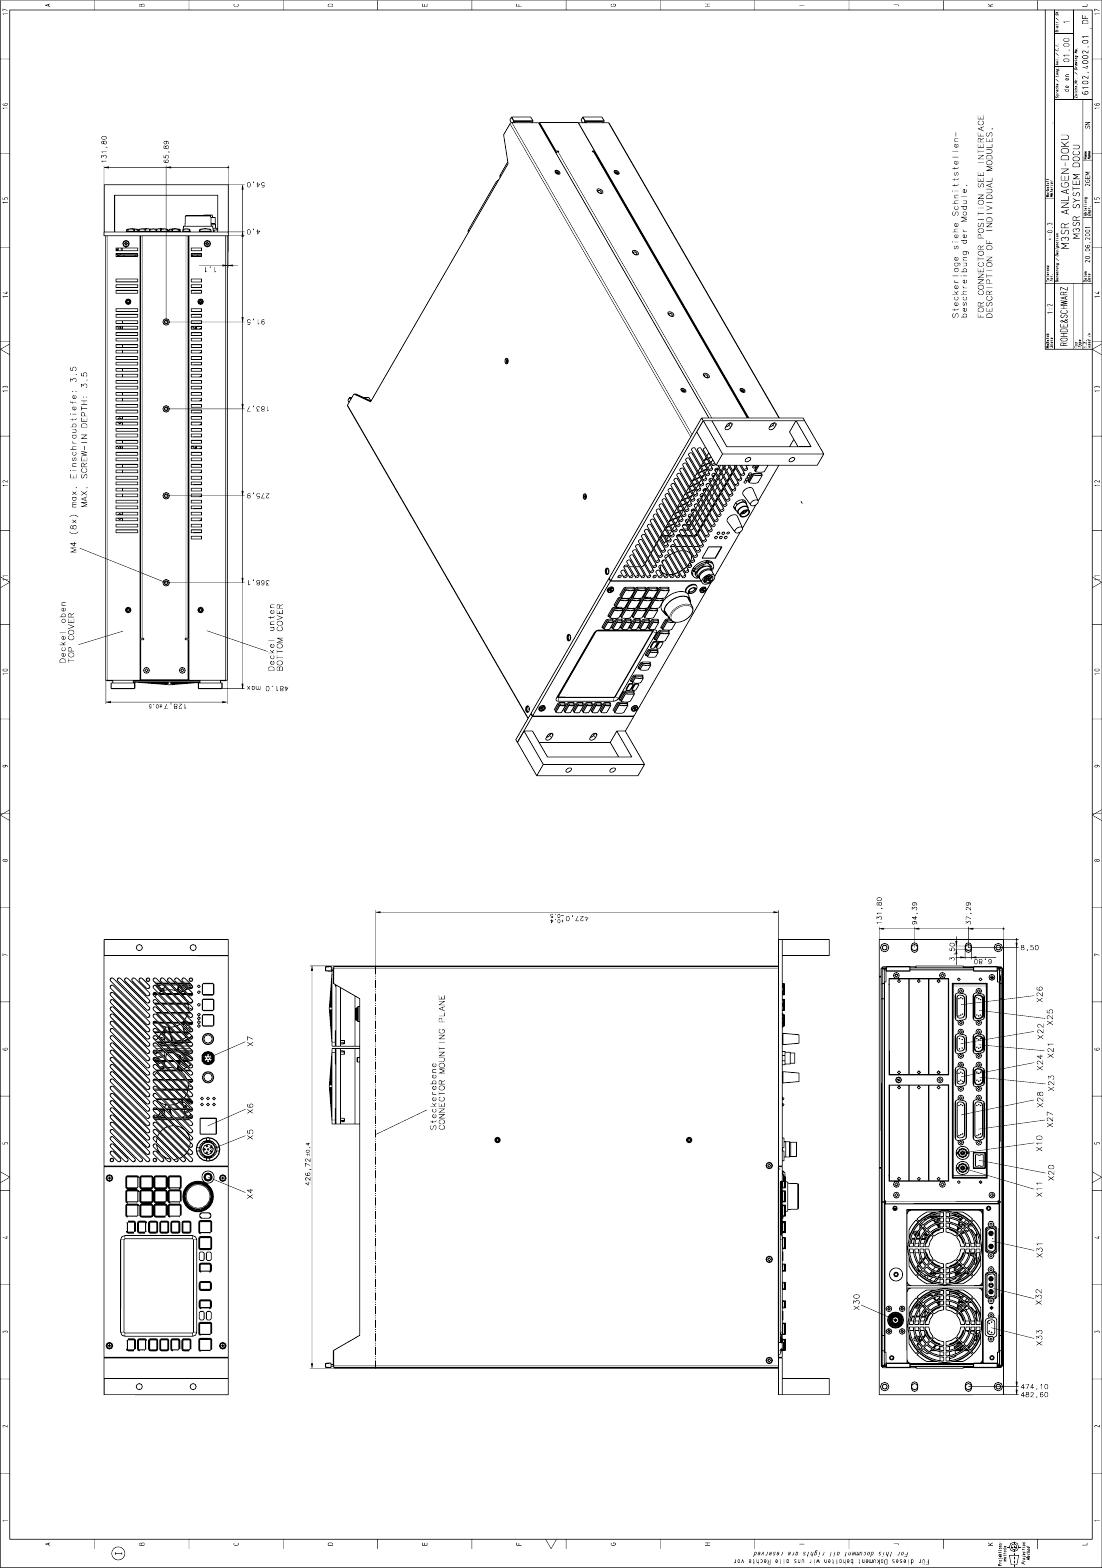 Ethernet Schaltplan Haus